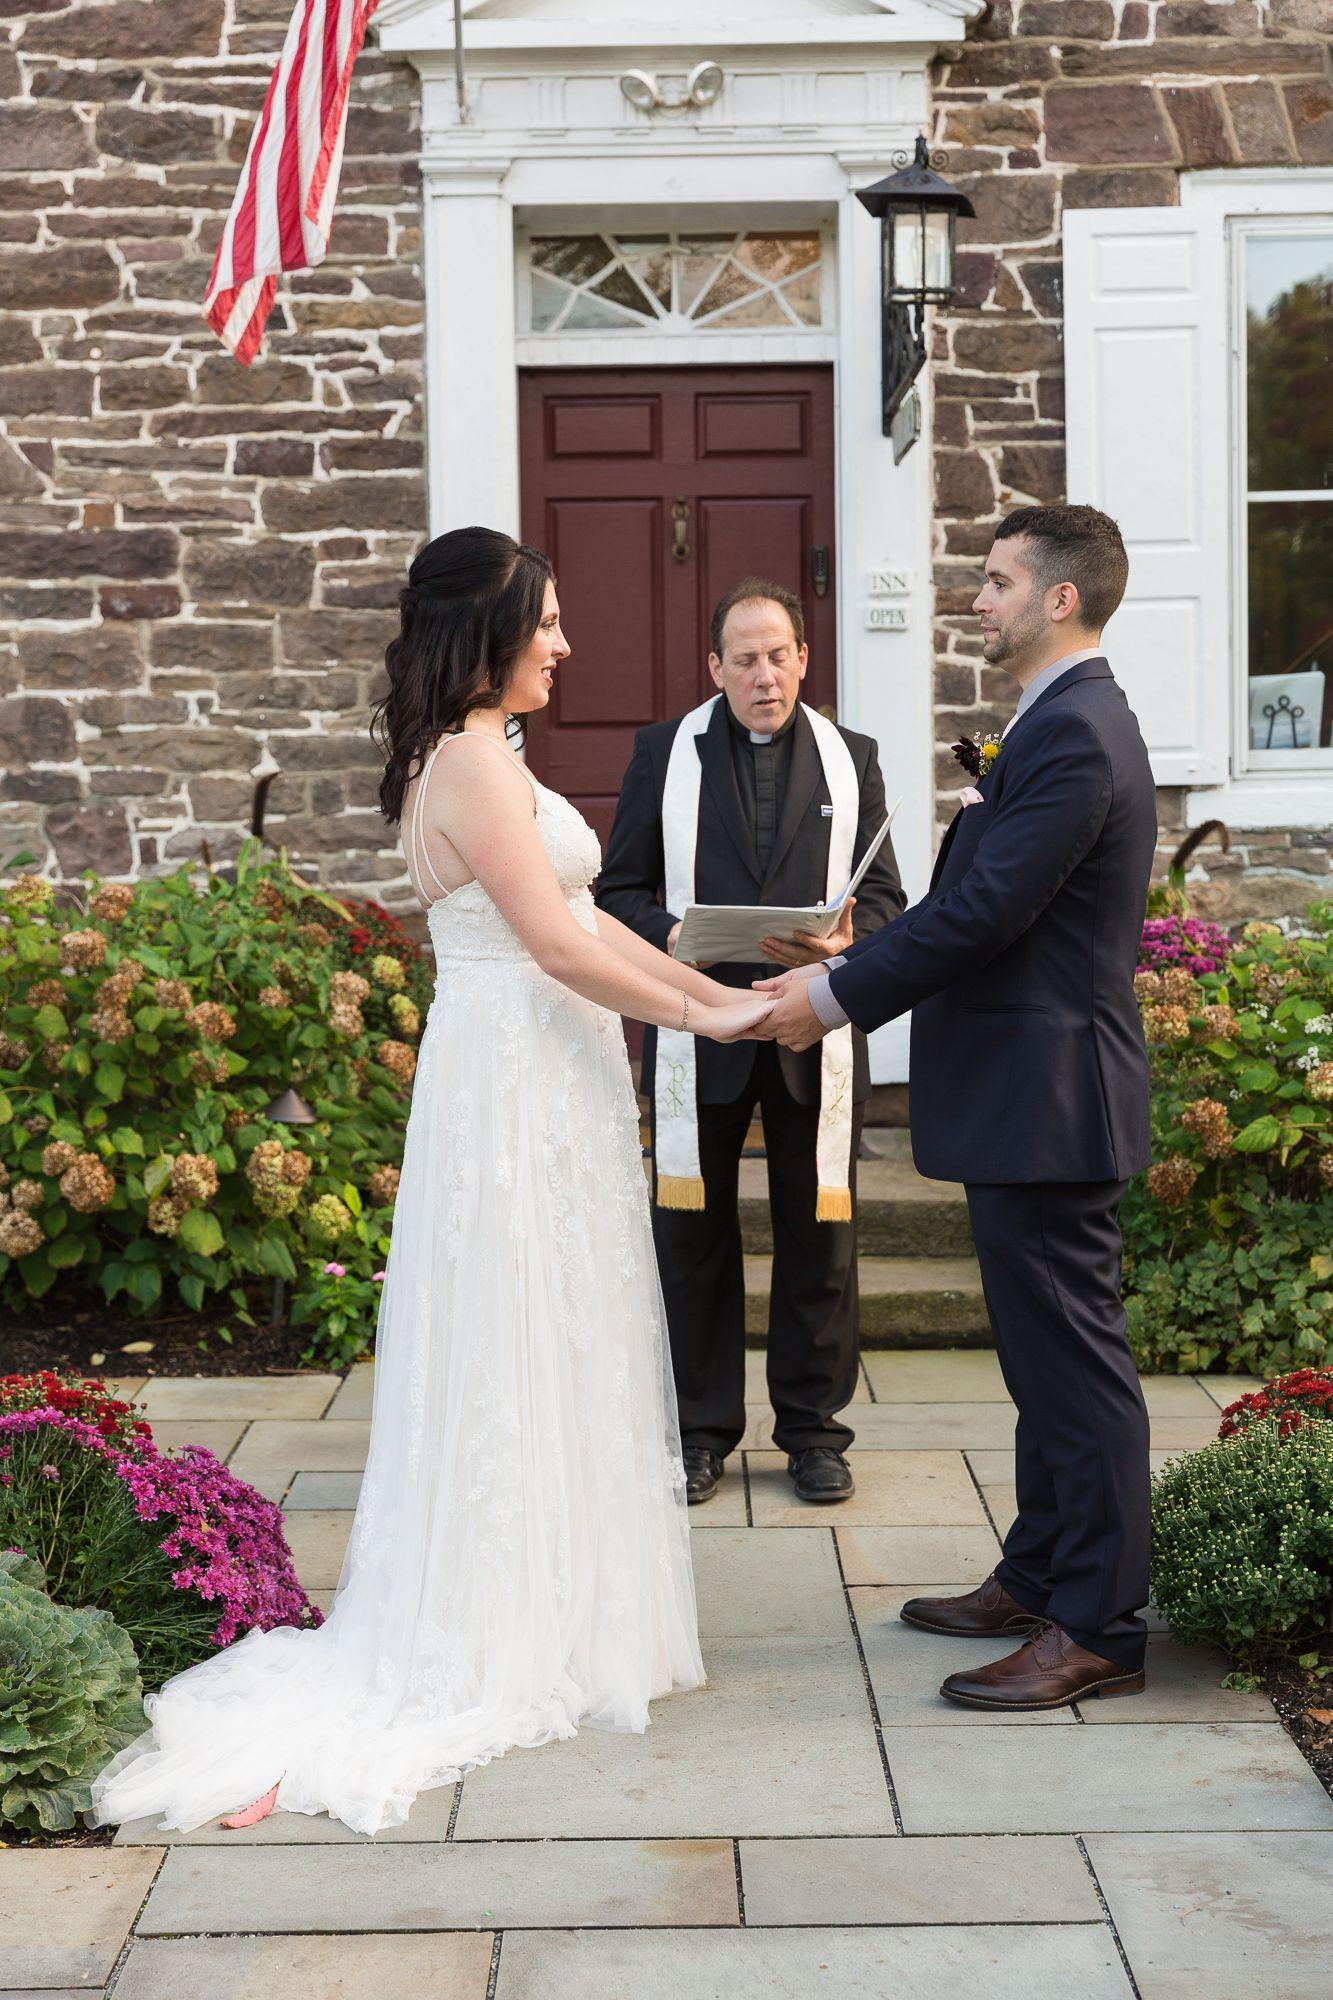 Wedding Ceremony At Woolverton Inn In 2020 Wedding Dresses Lace Wedding Wedding Dresses